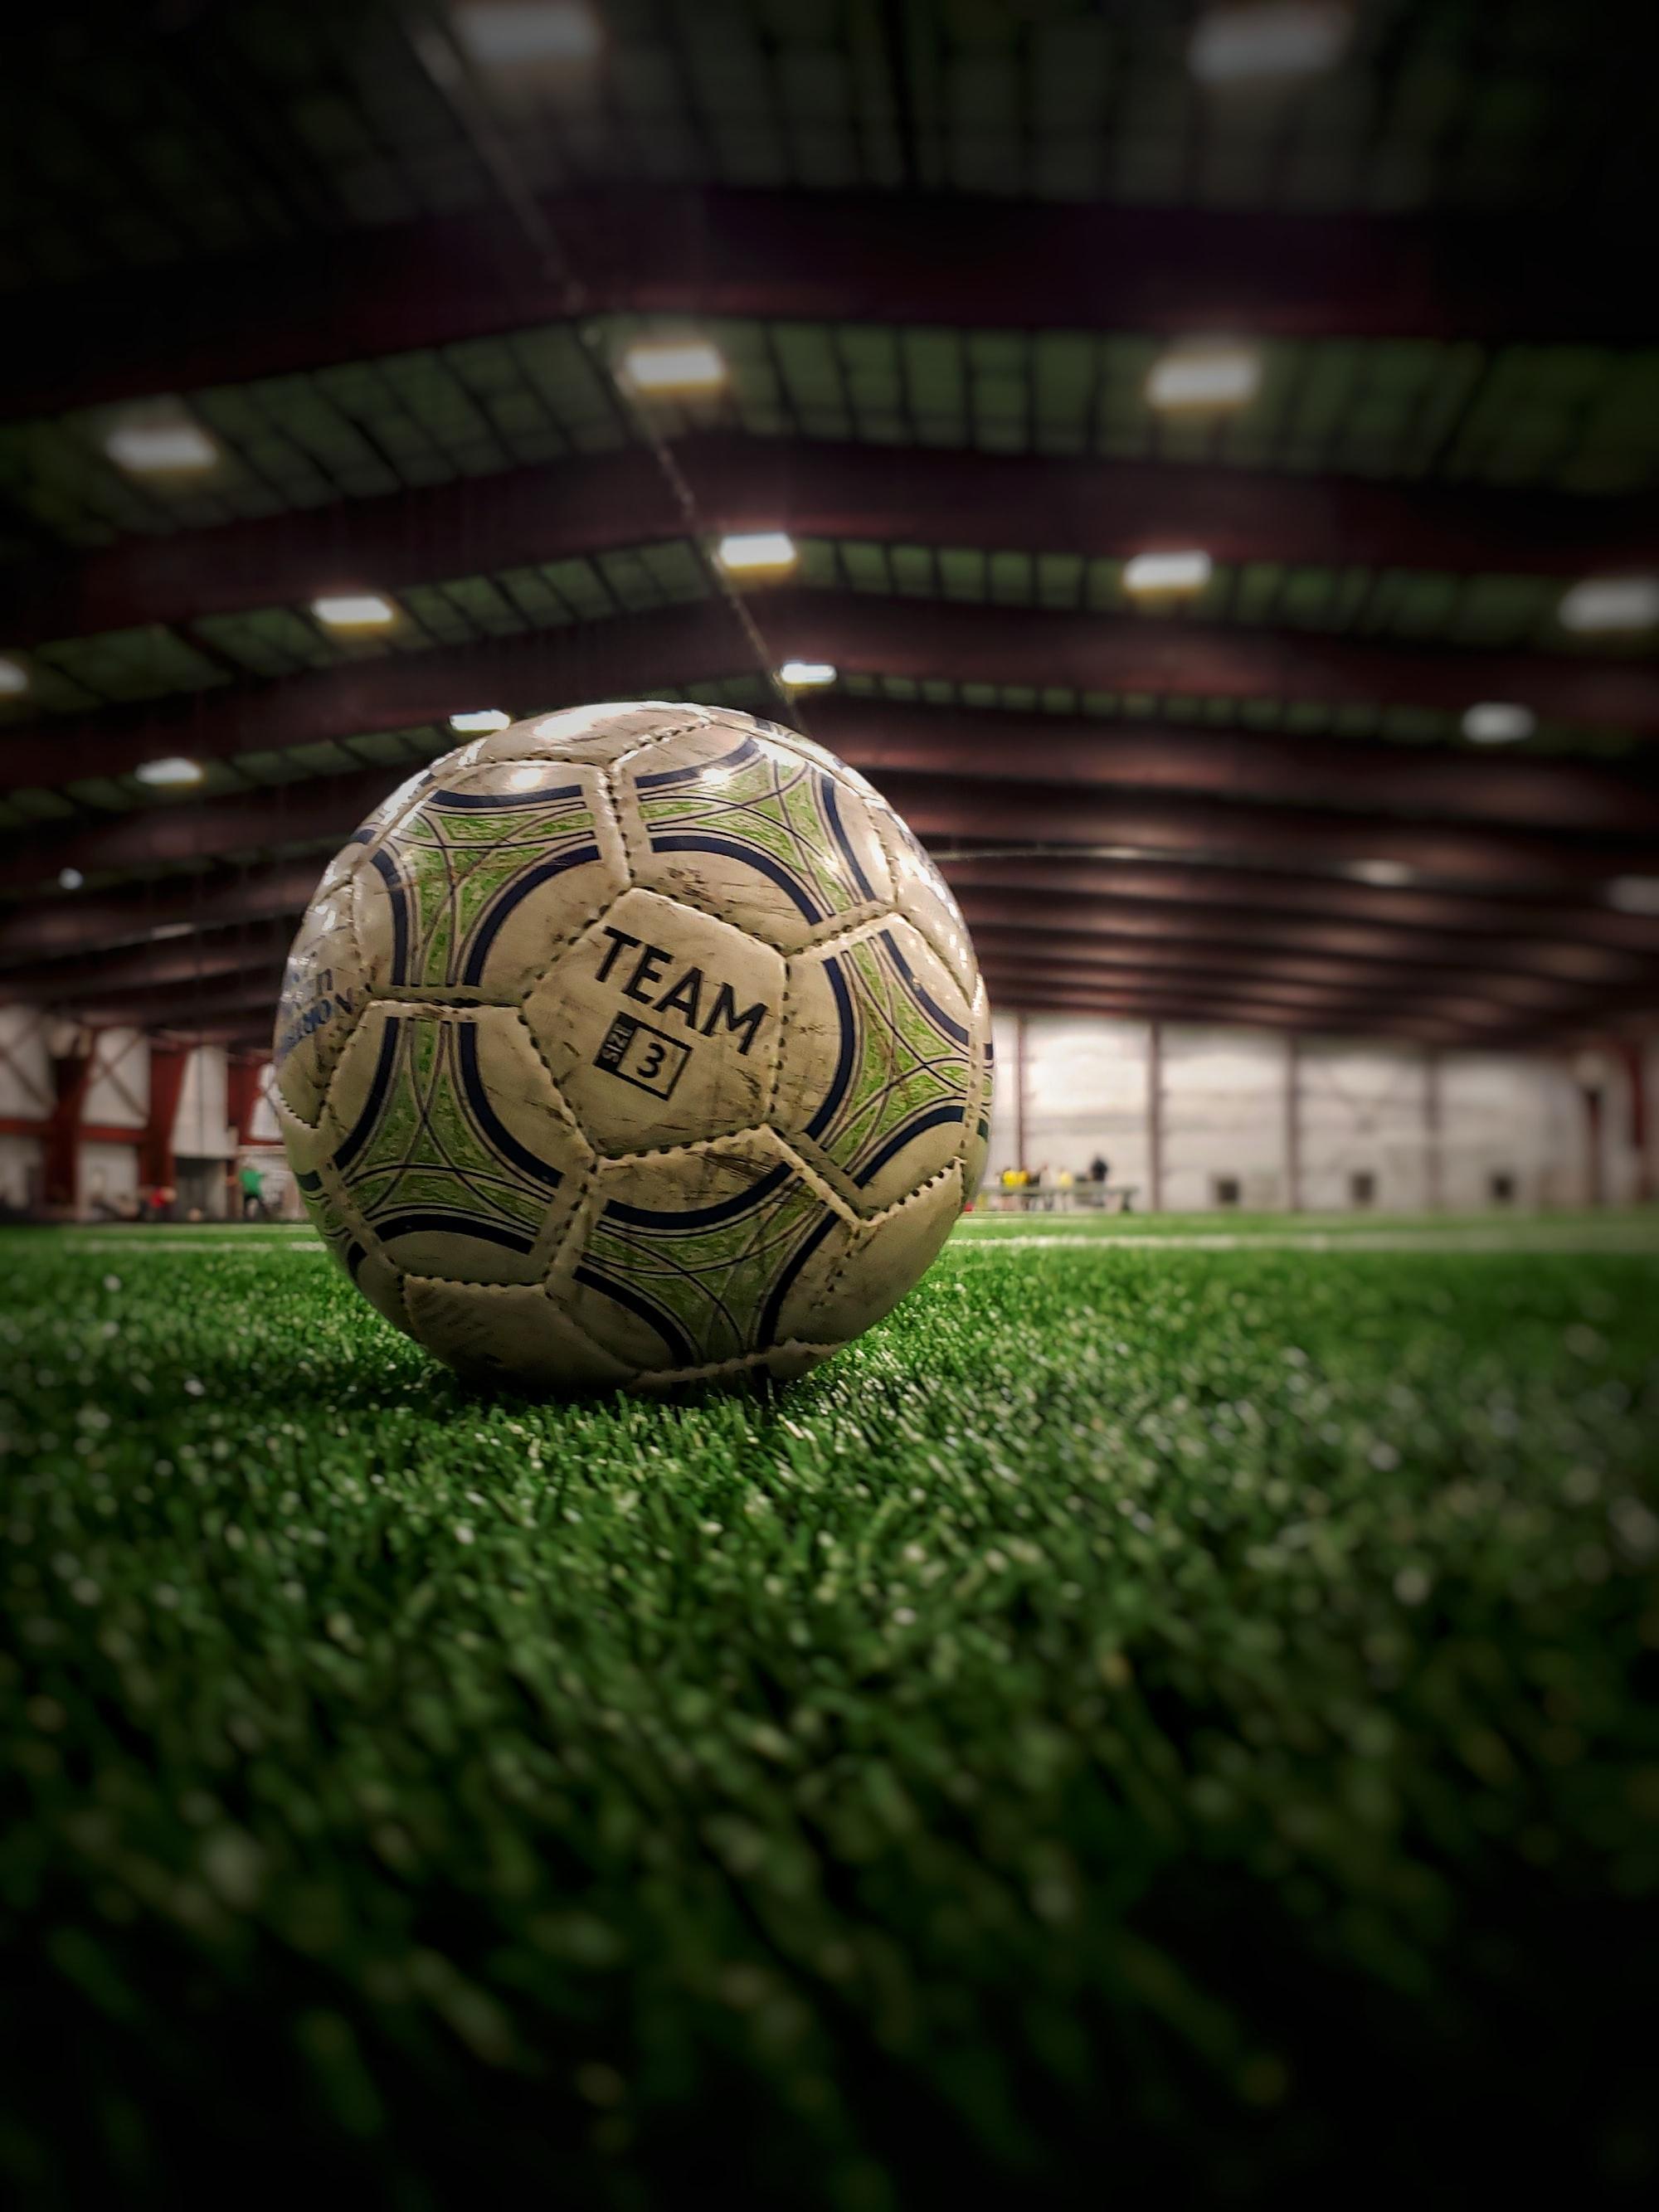 Schedina calcio: i pronostici del lunedì - 18/01/2021